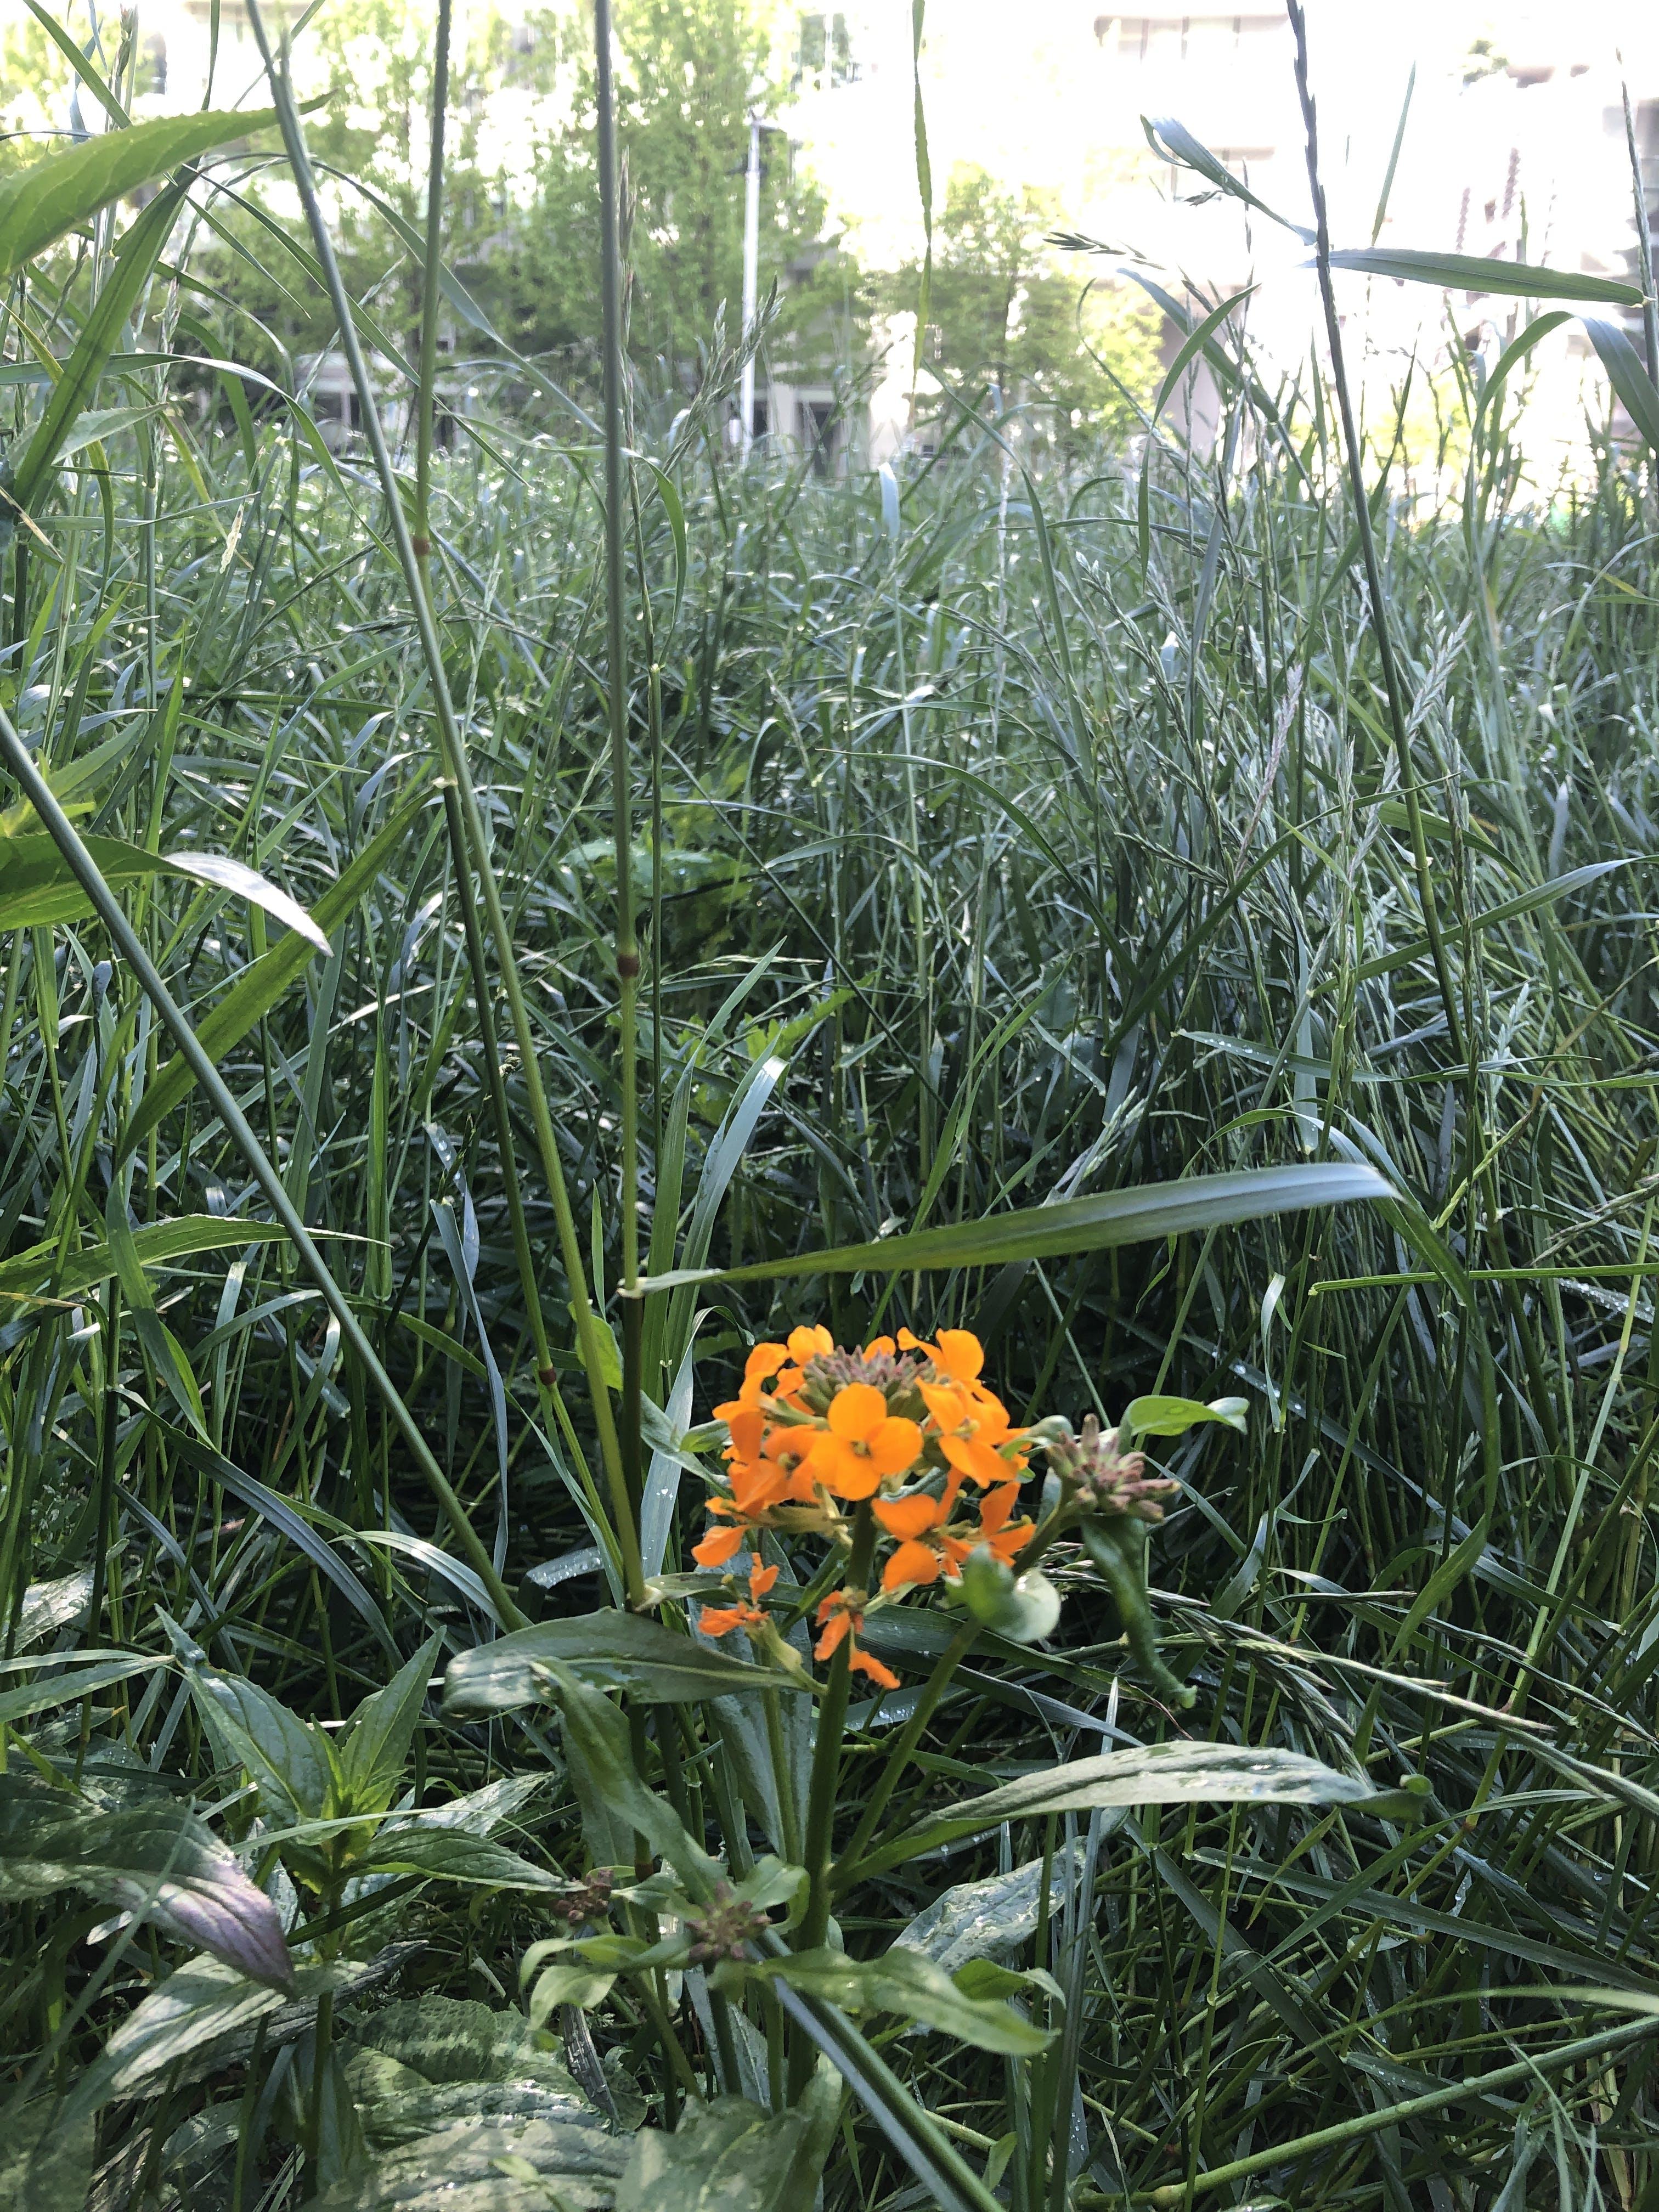 April 27, 2021 - Siberian Wallflower / Cheiranthus allionii